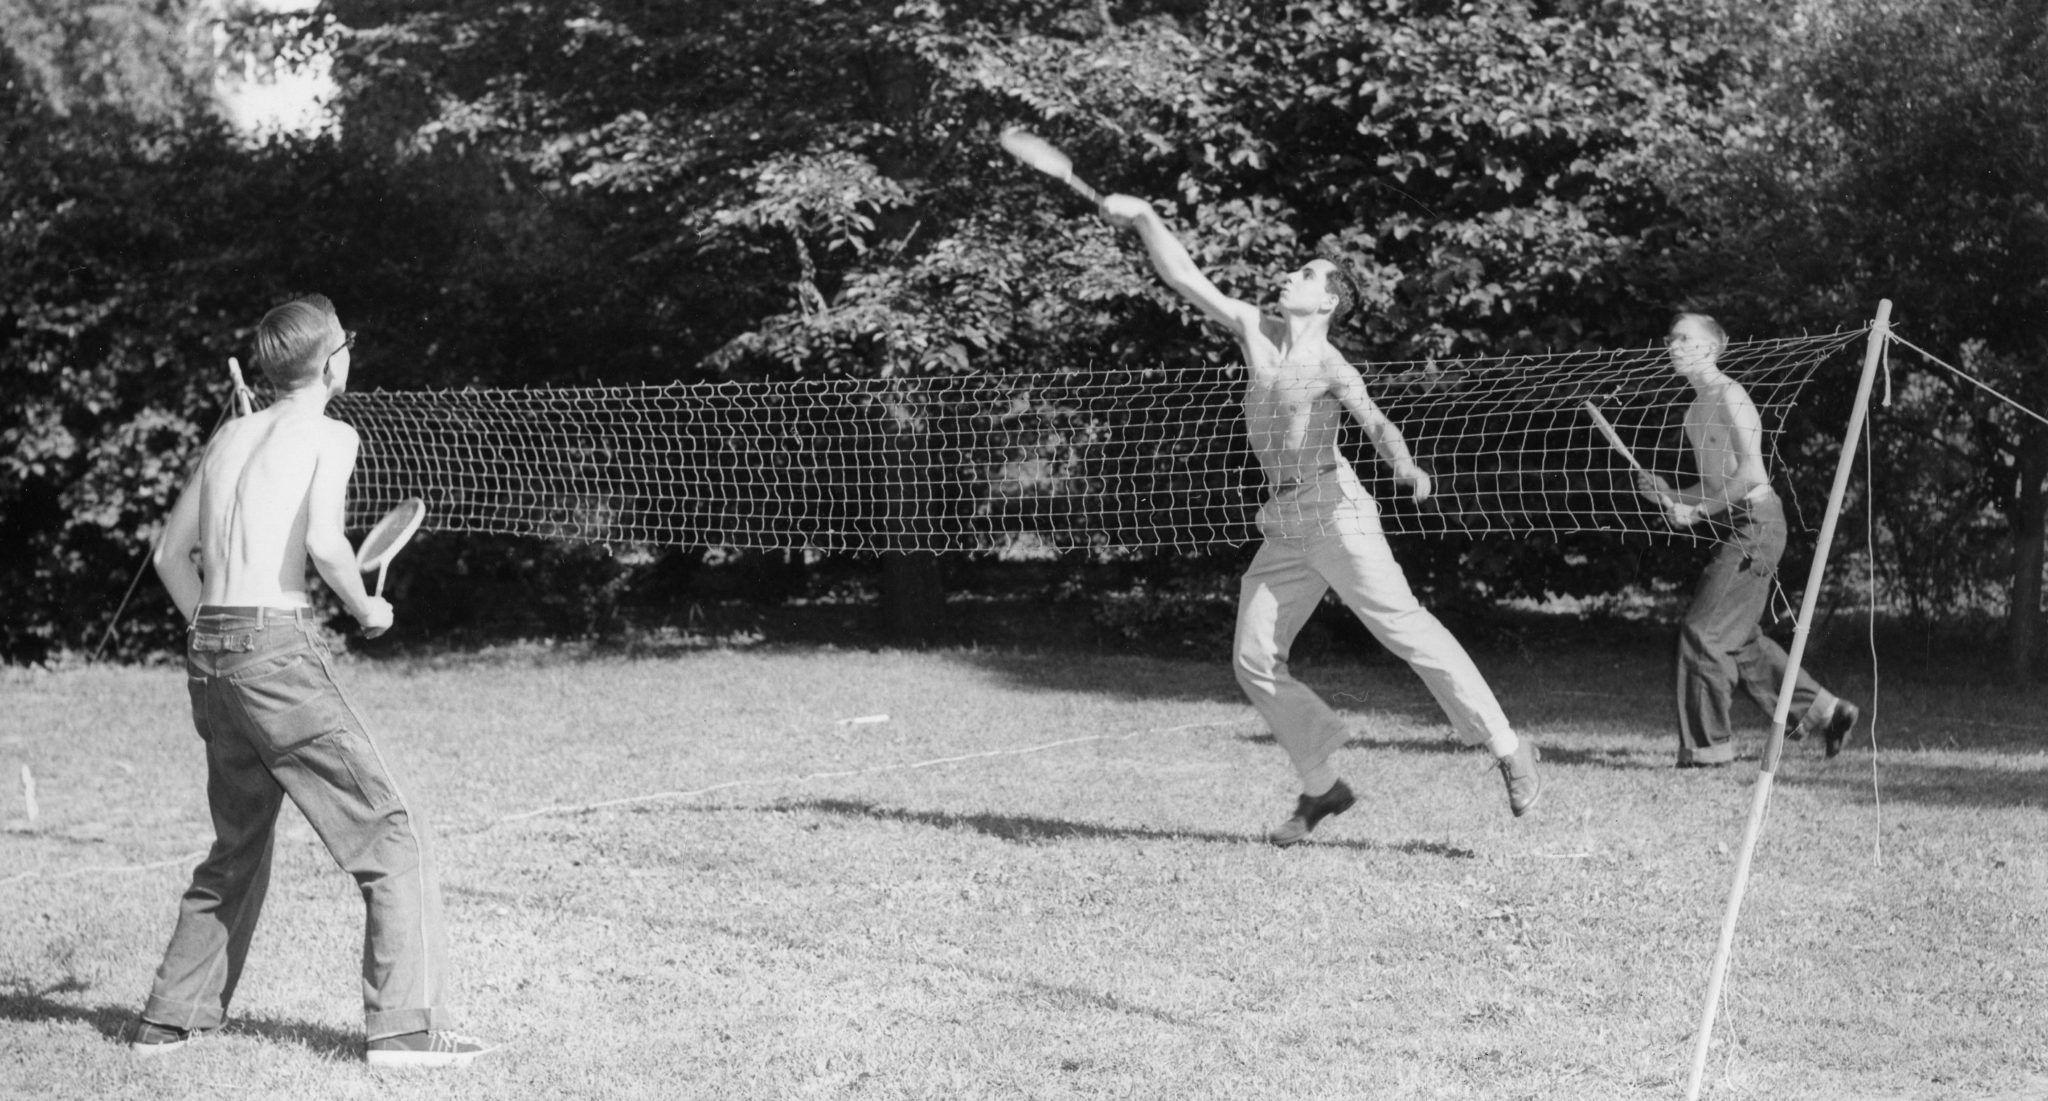 Our Badminton History Badminton Badminton Court History